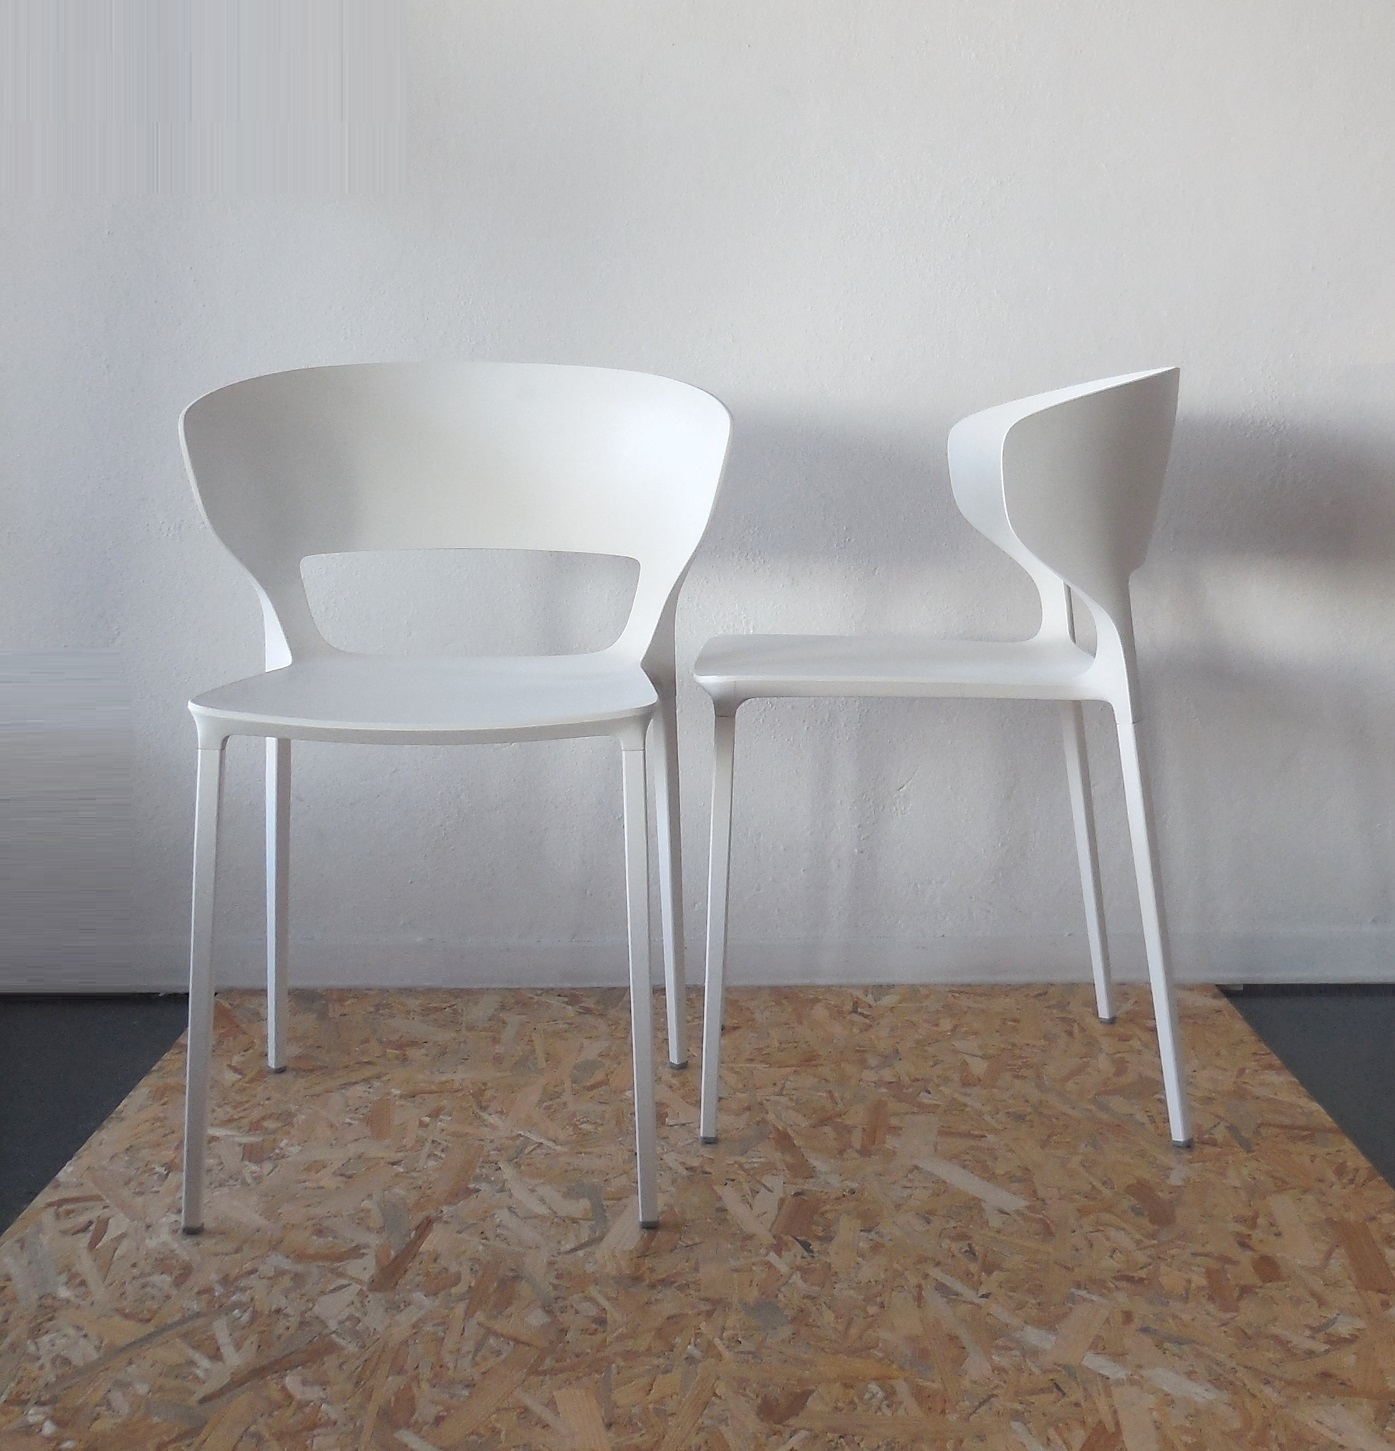 Cool sedia desalto set sedie con braccioli koki design for Sedie design plastica